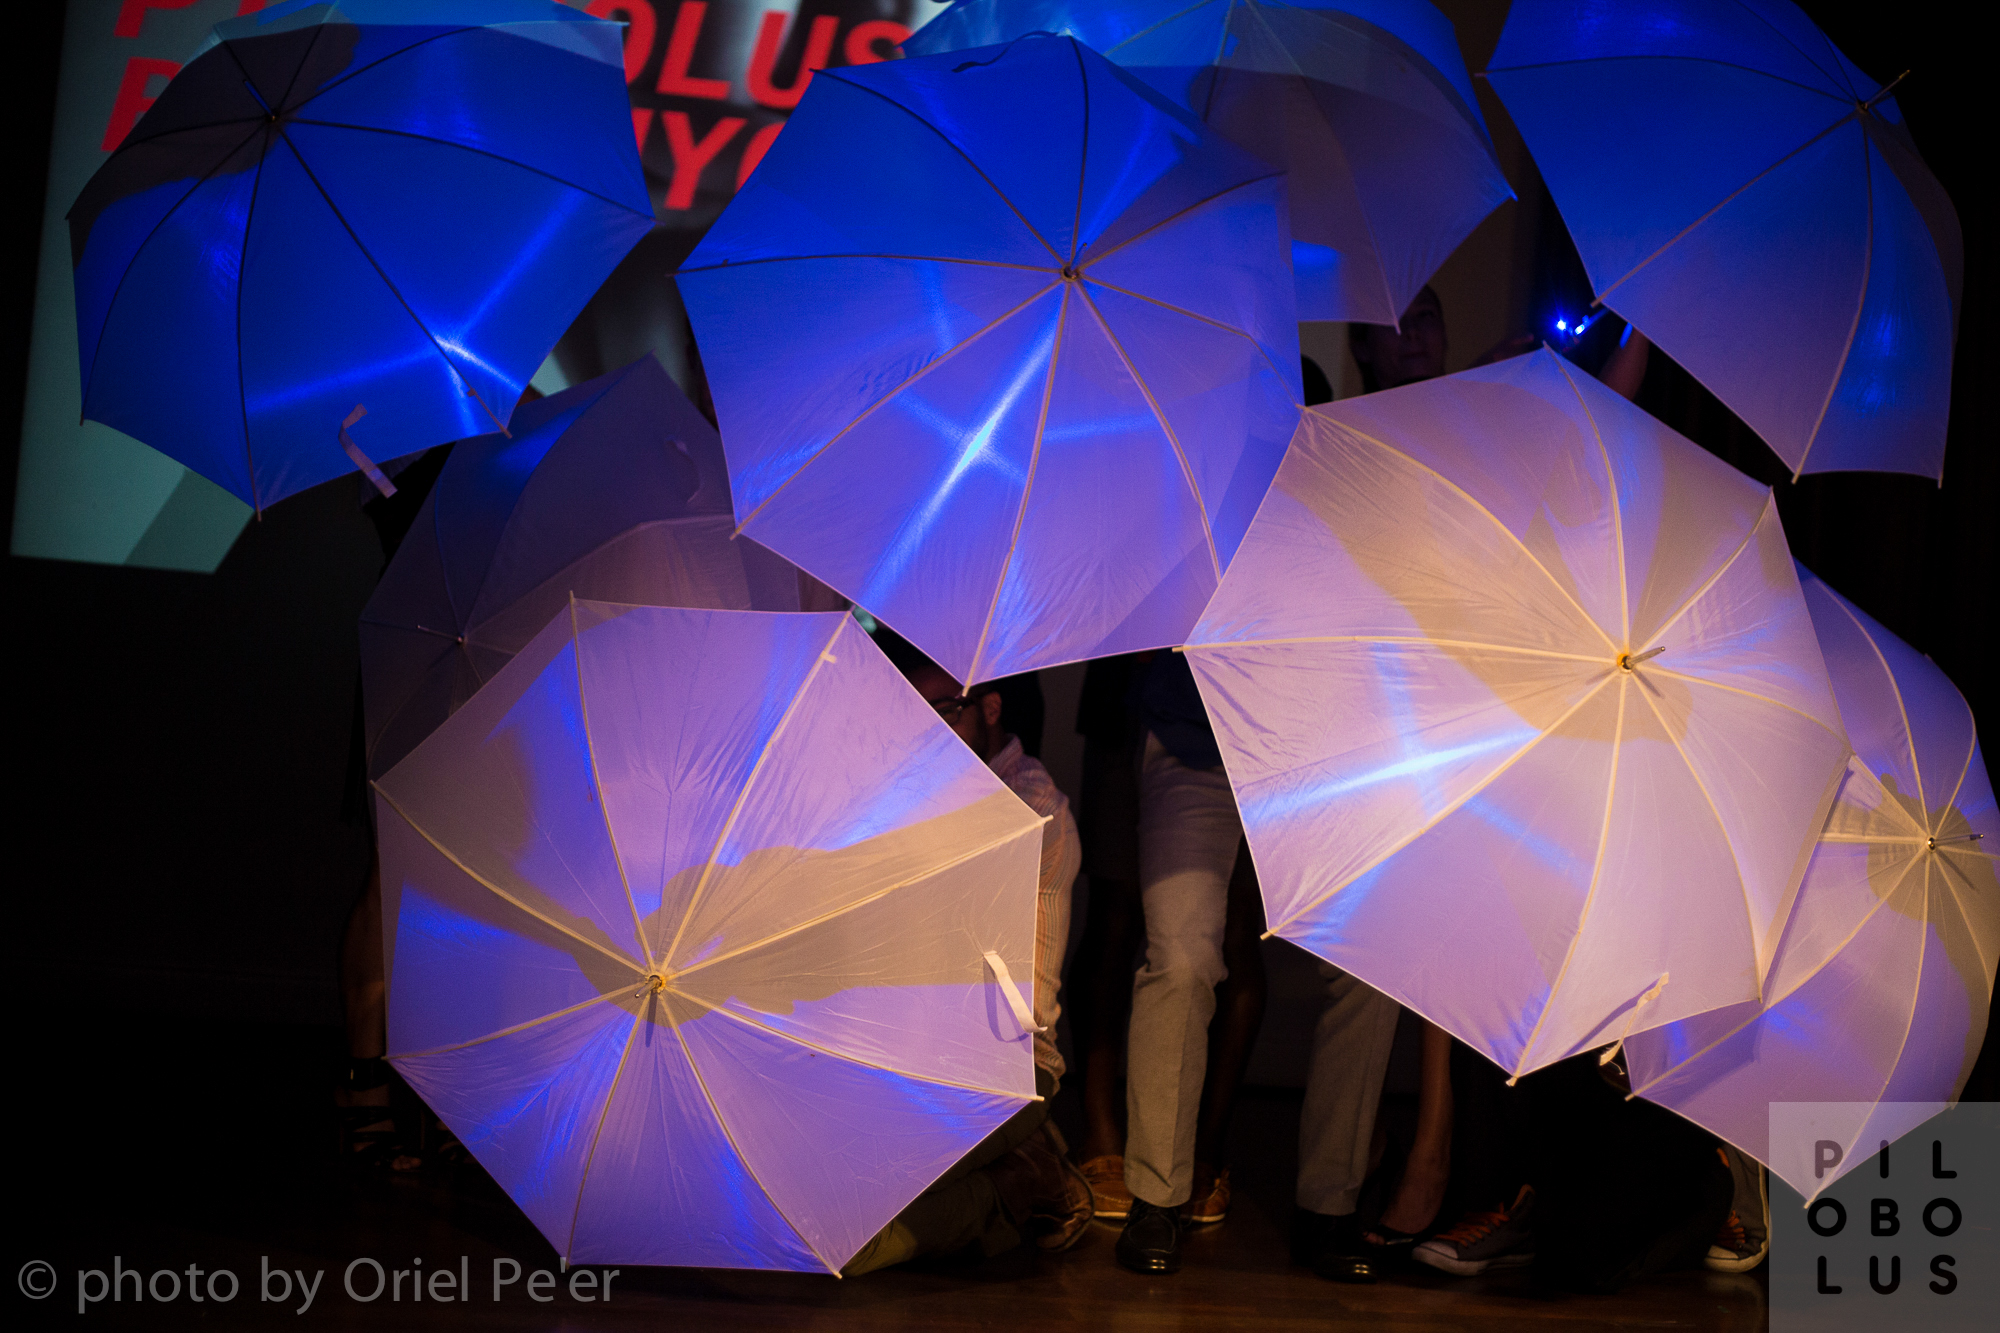 An Umbrella Event at the 2014 Pilobolus Ball/NYC